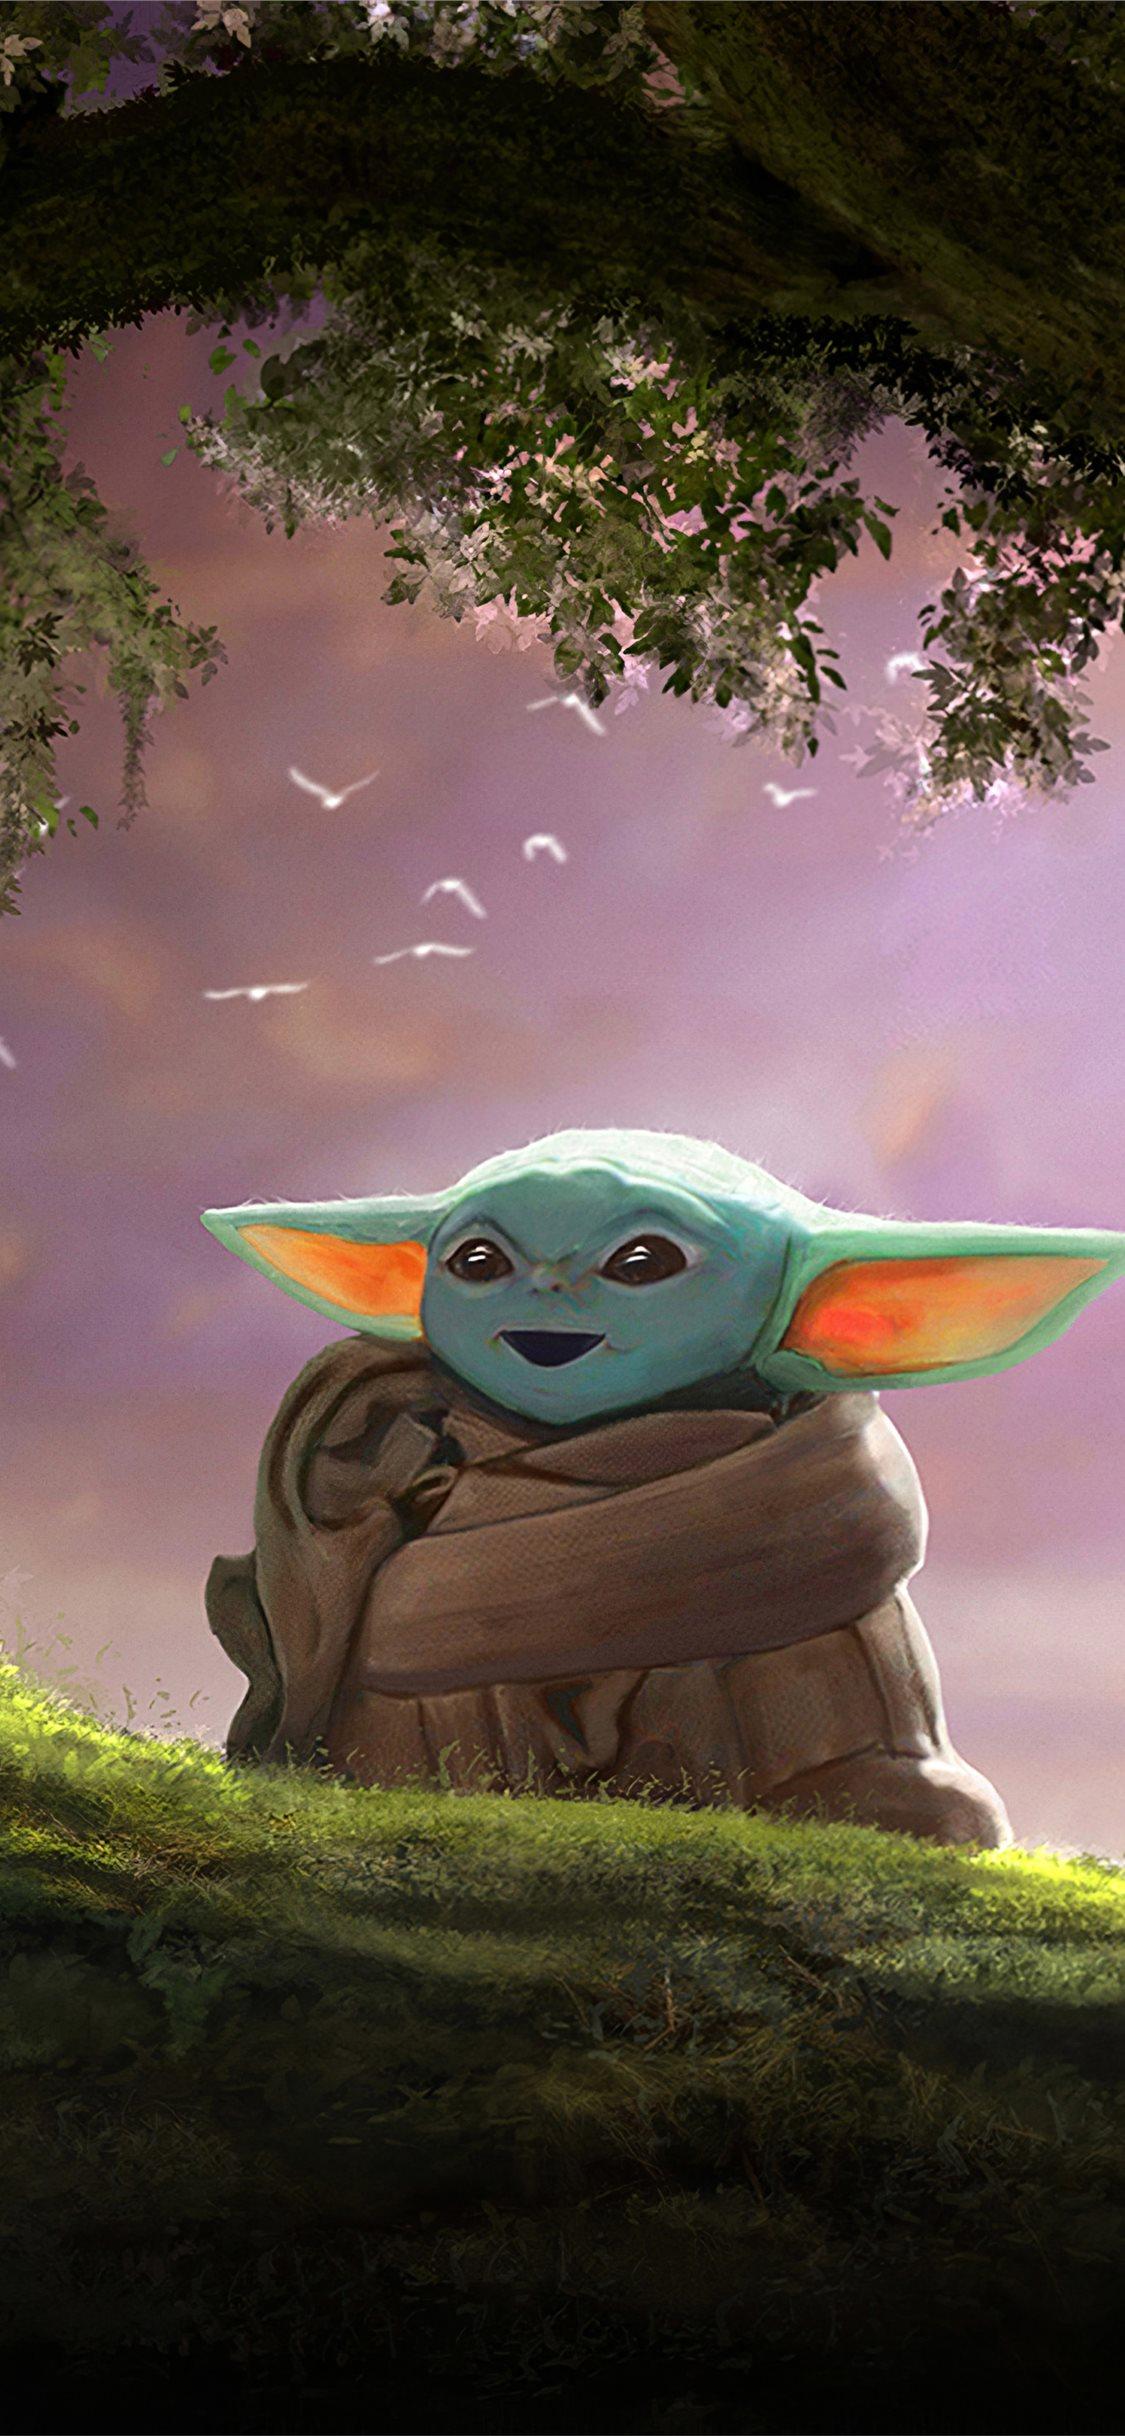 Baby Yoda Fanart 4k Iphone X Wallpapers Free Download